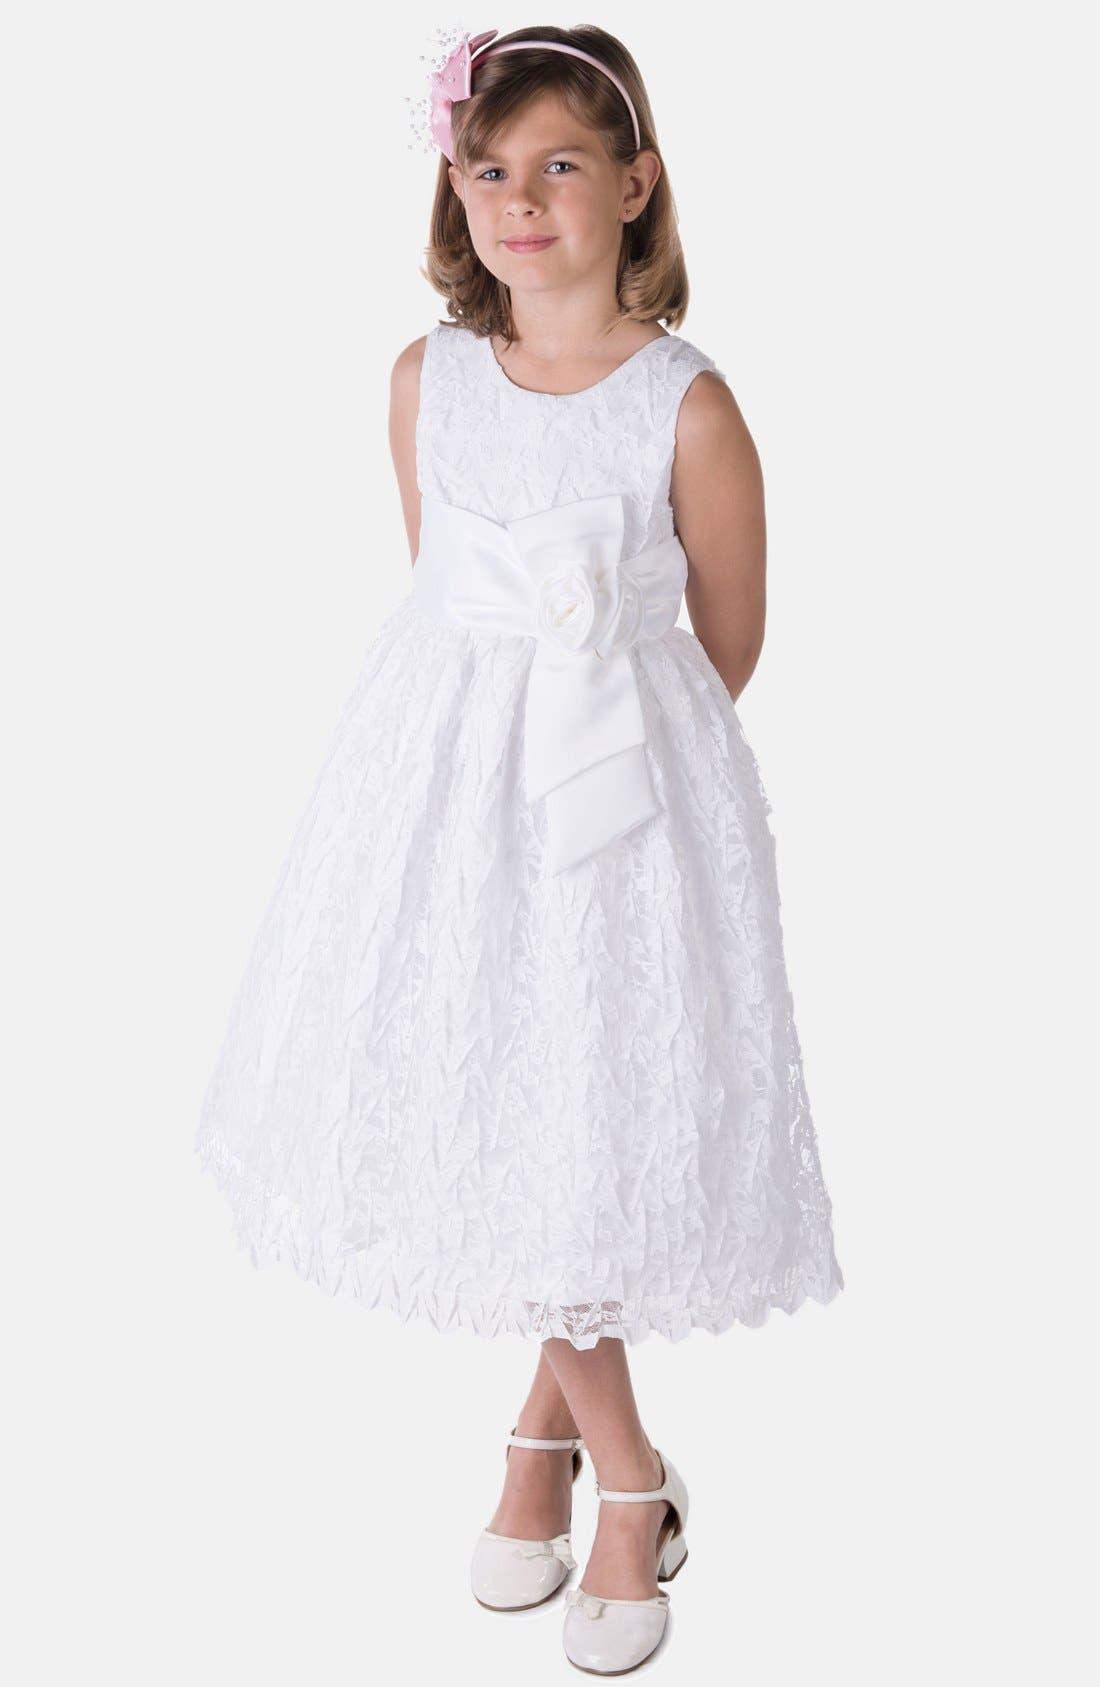 C.I. Castro & Co. Sleeveless Lace Dress,                         Main,                         color, White